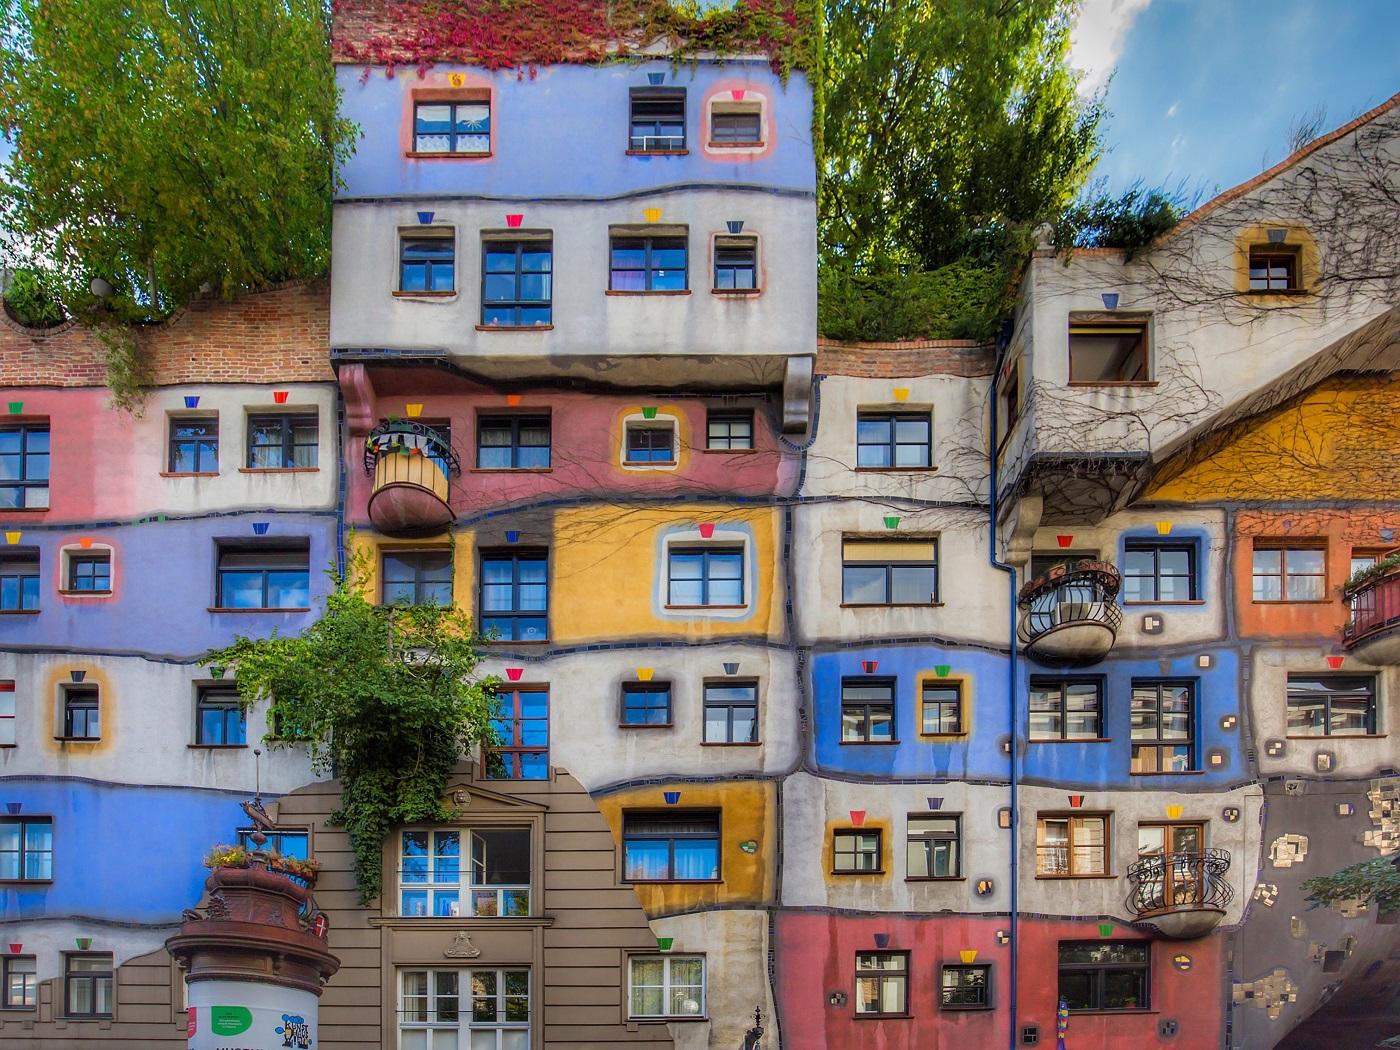 Hundertwasserhaus (Дом Хундертвассера)